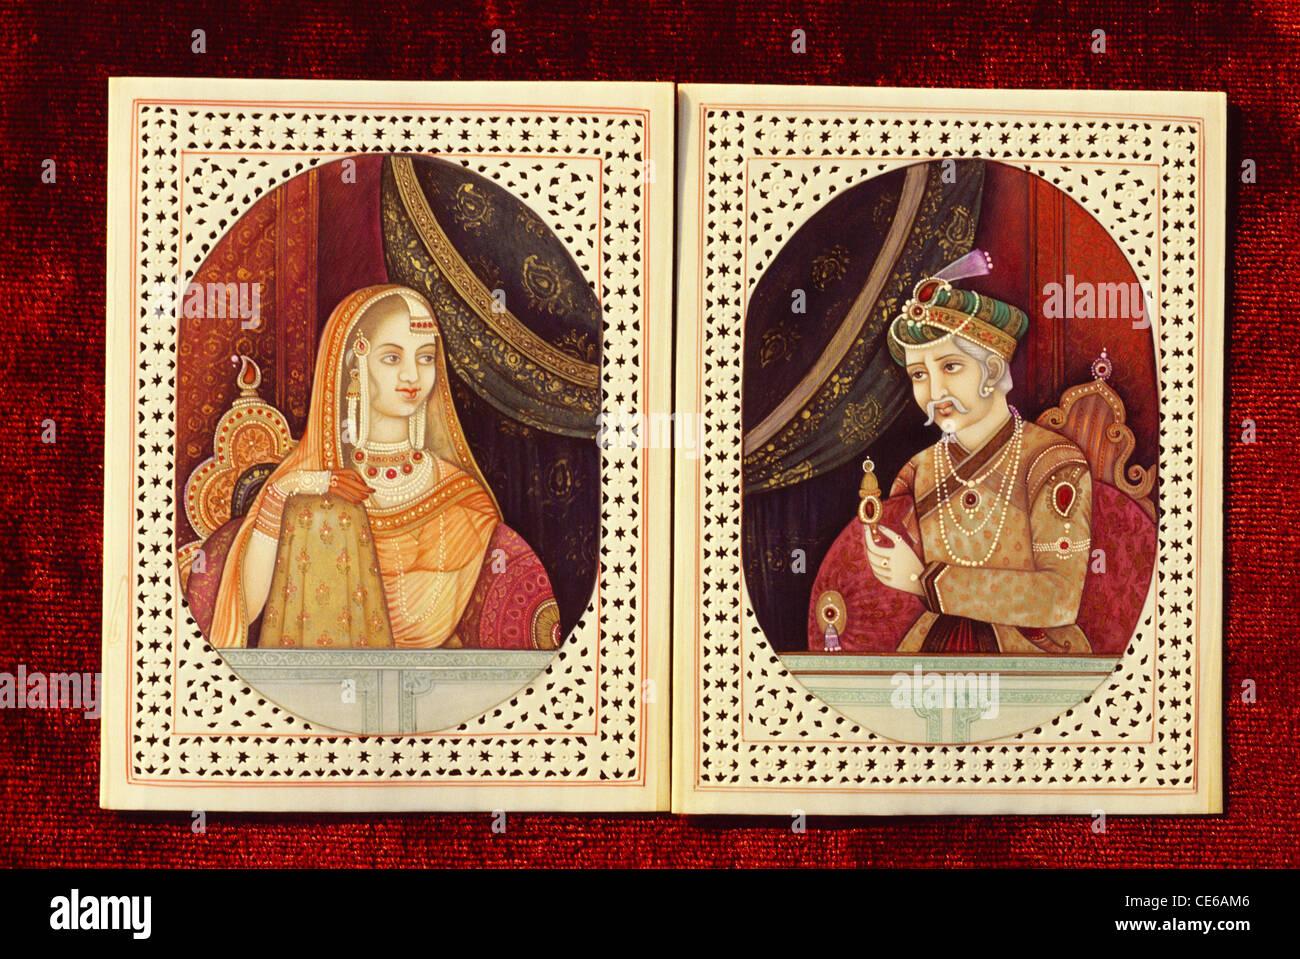 Mughal emperor Akbar & Jodhabai ivory painting - bdr 68672 - Stock Image